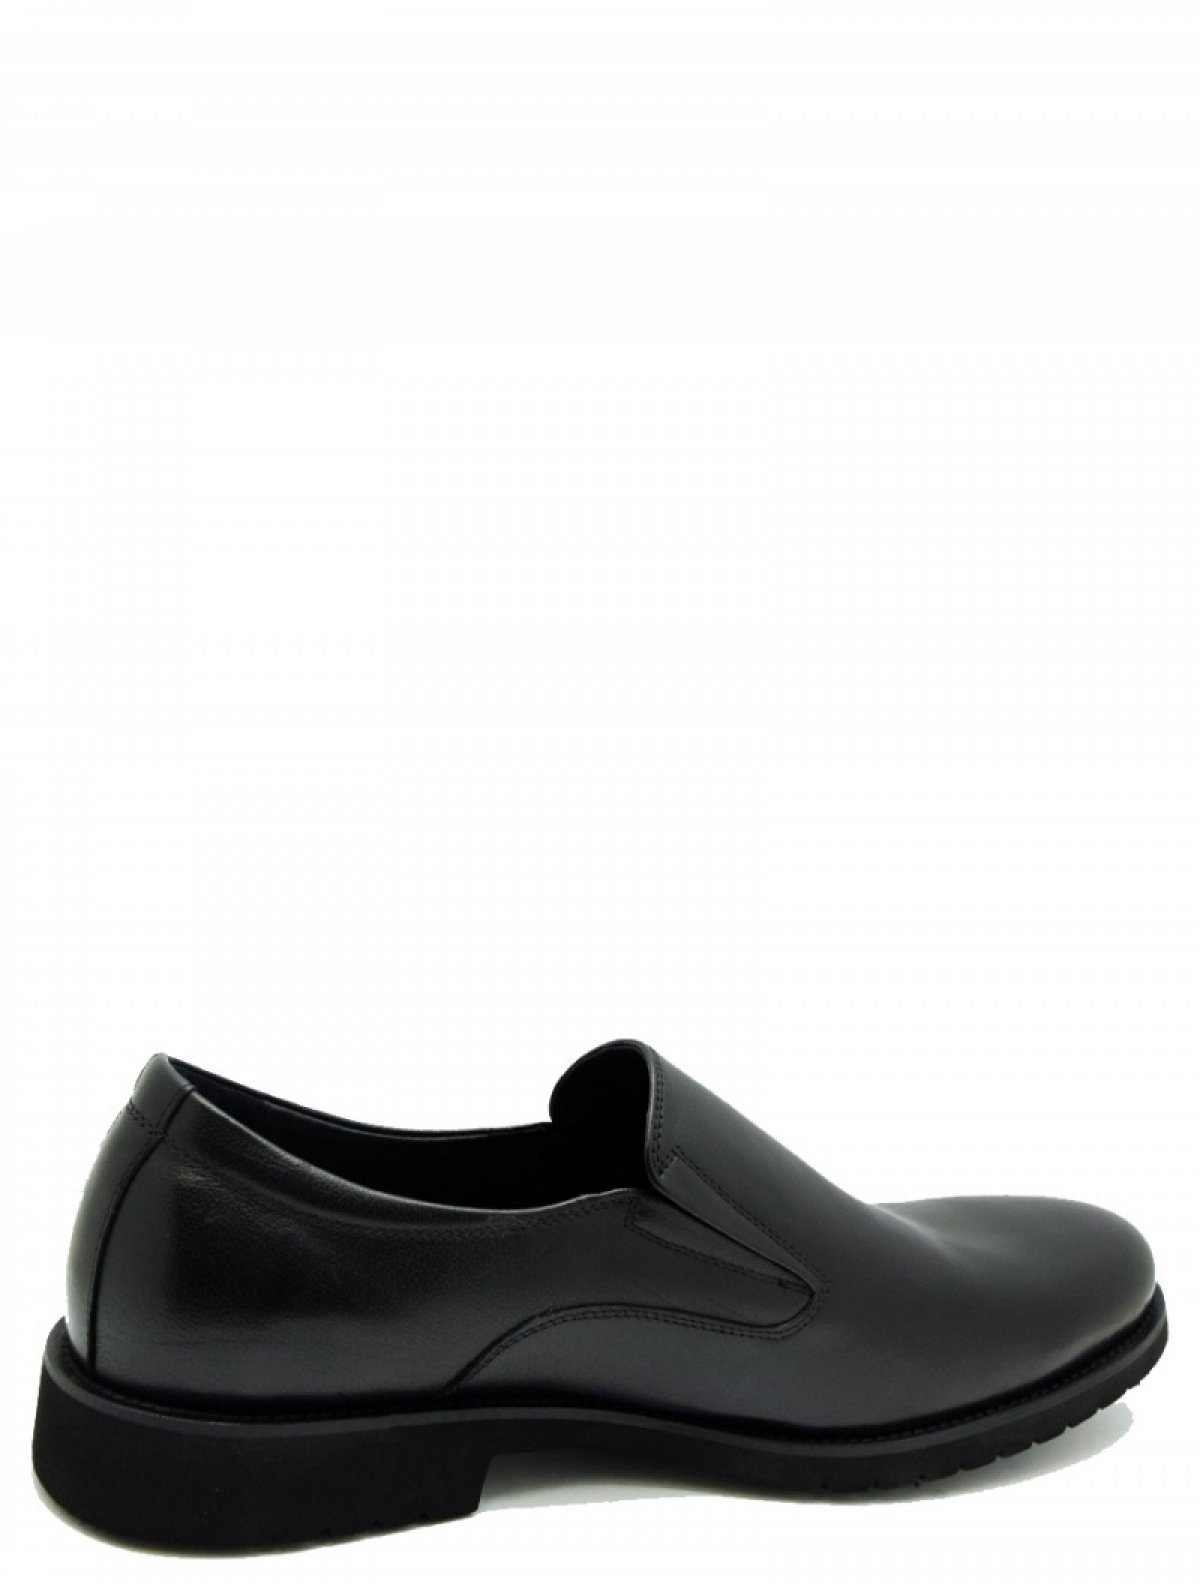 DINO RICCI 104-236-03-L/92 мужские туфли